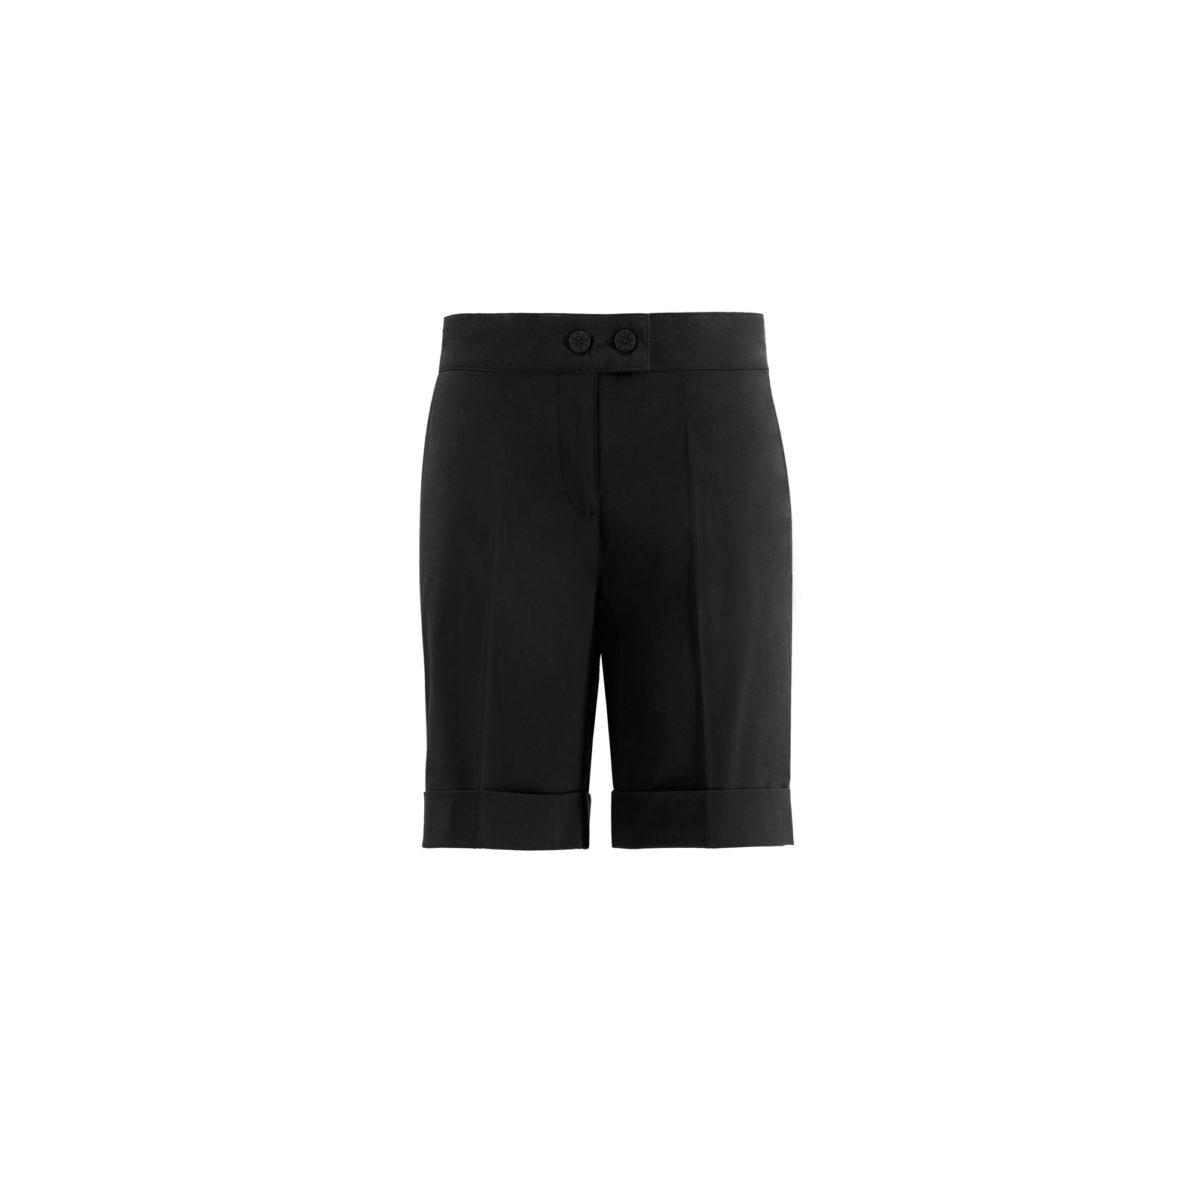 Shorts Bermuda Nero - vista frontale | Nicla